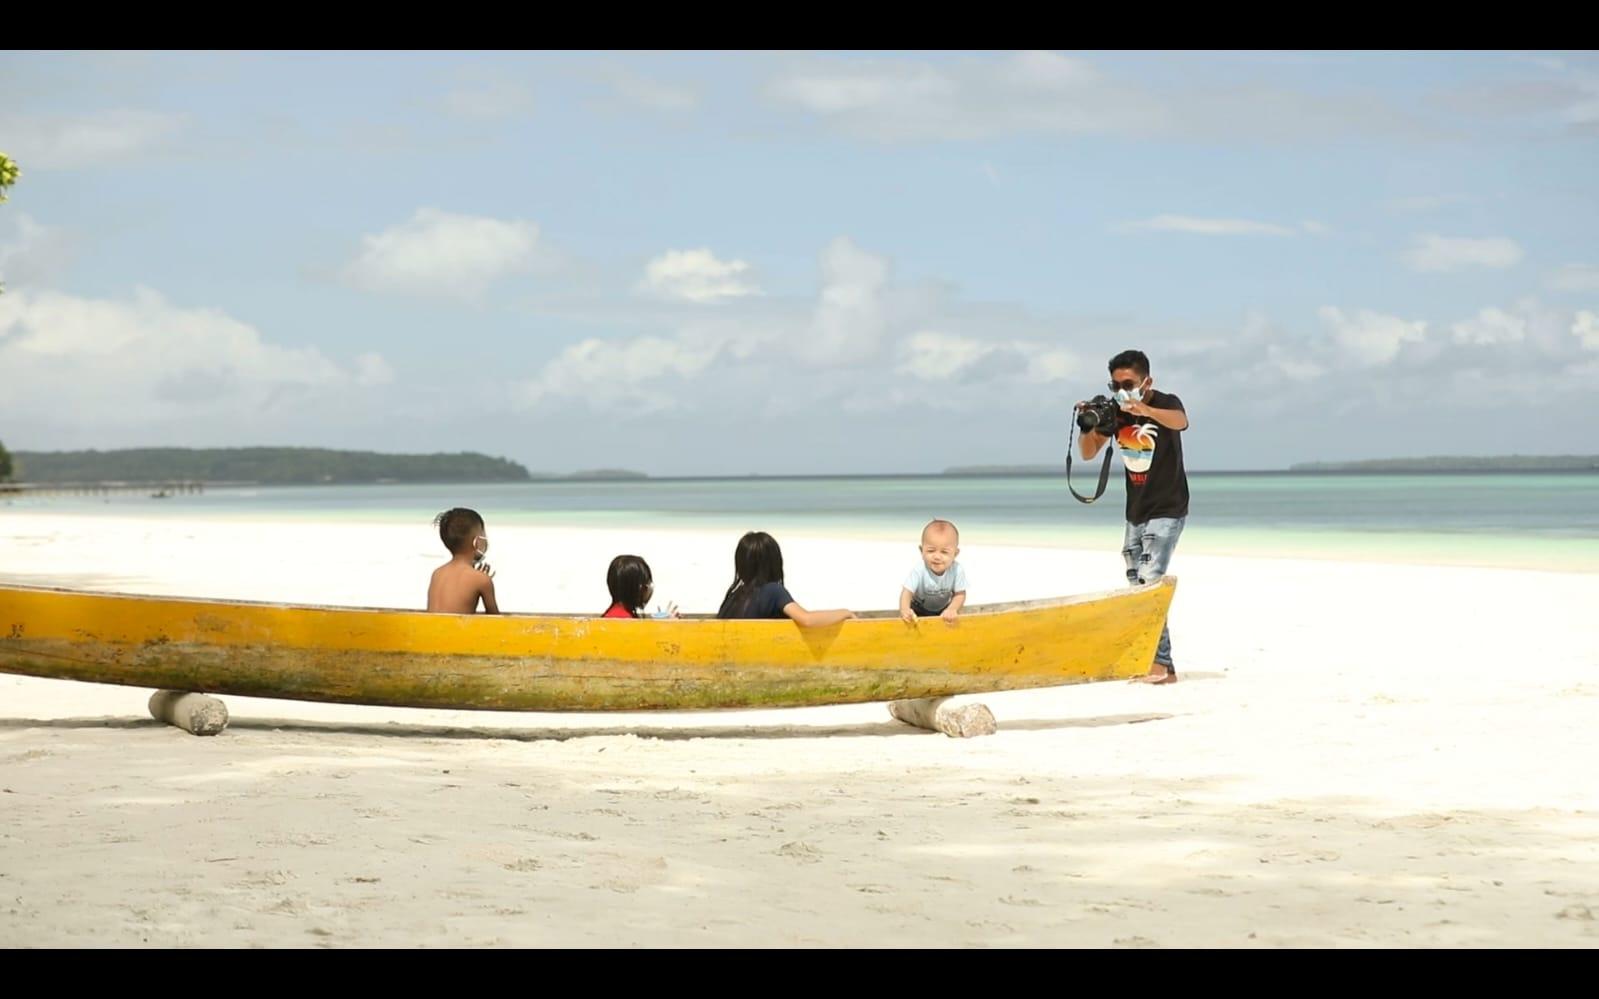 Pantai Ngurbolat, Surga Kecil di Maluku Tenggara